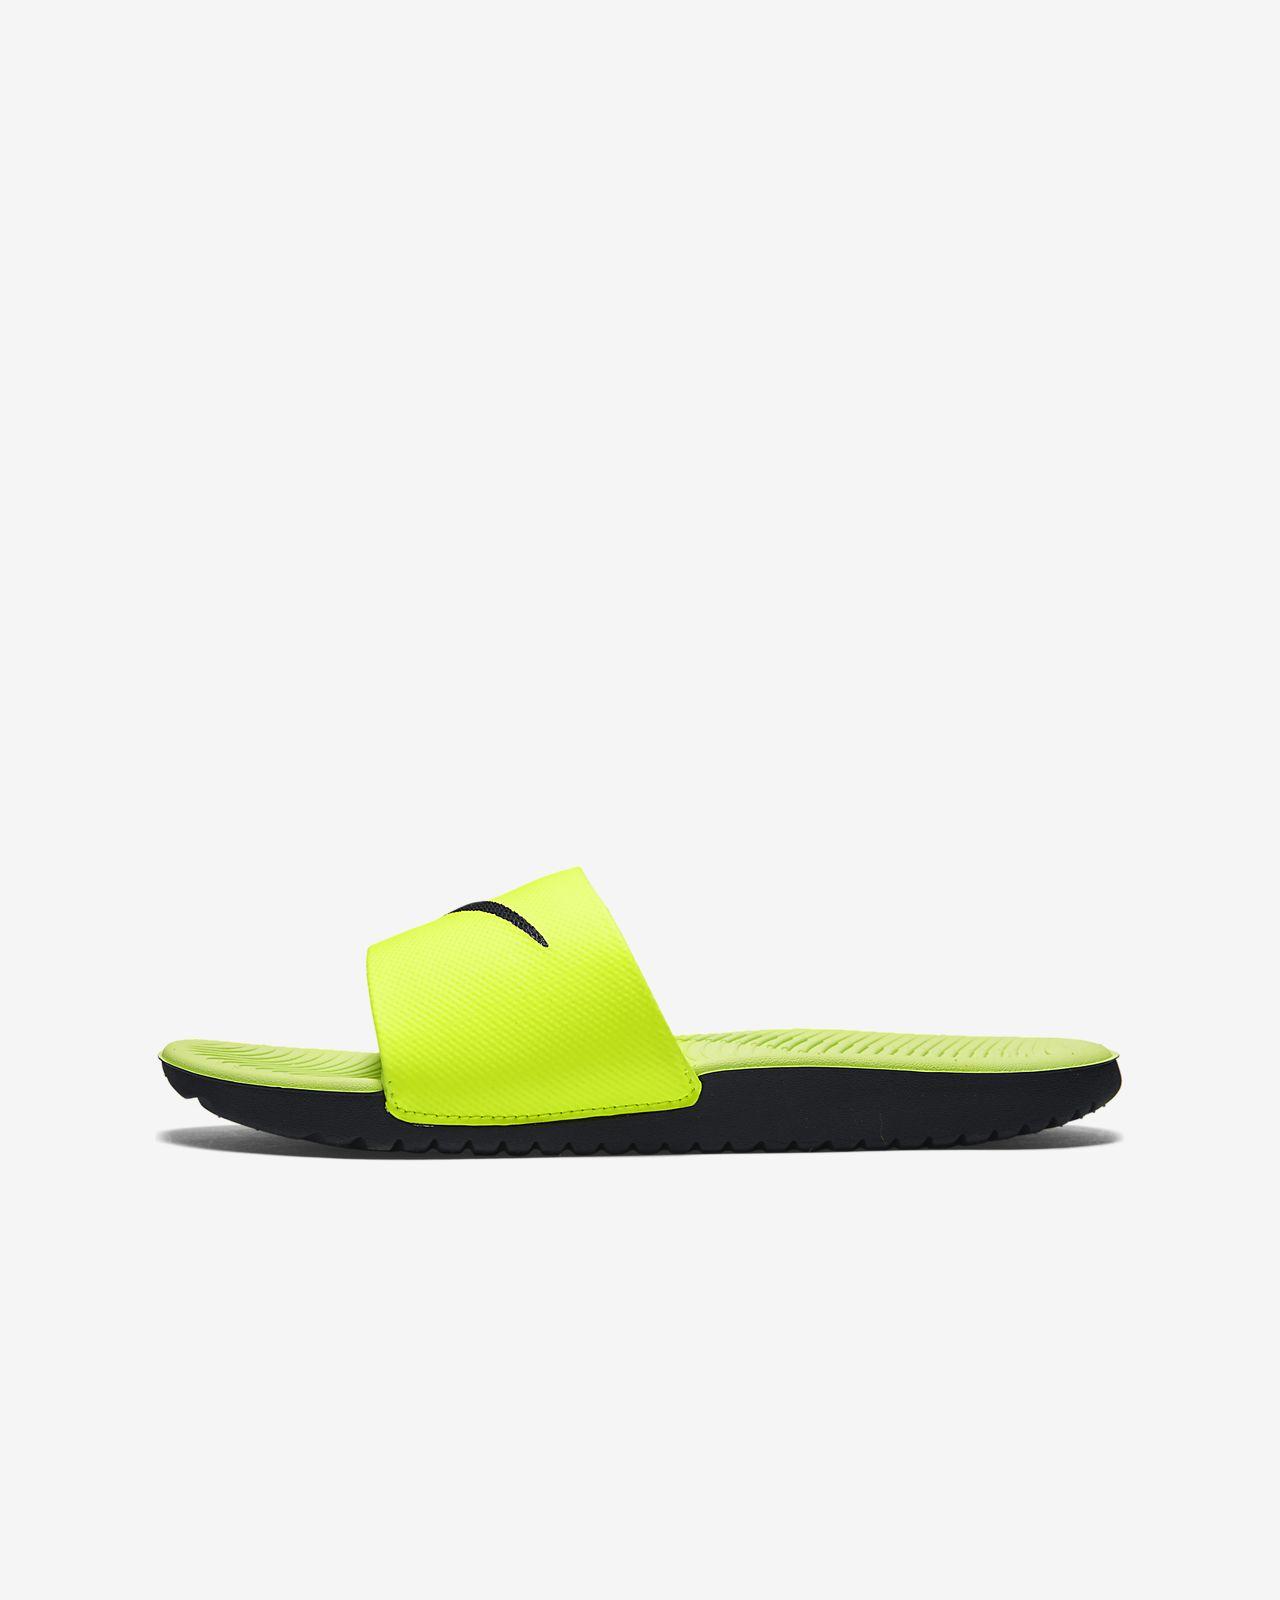 83d2bce2e54 Nike Kawa Little Big Kids  Slide. Nike.com